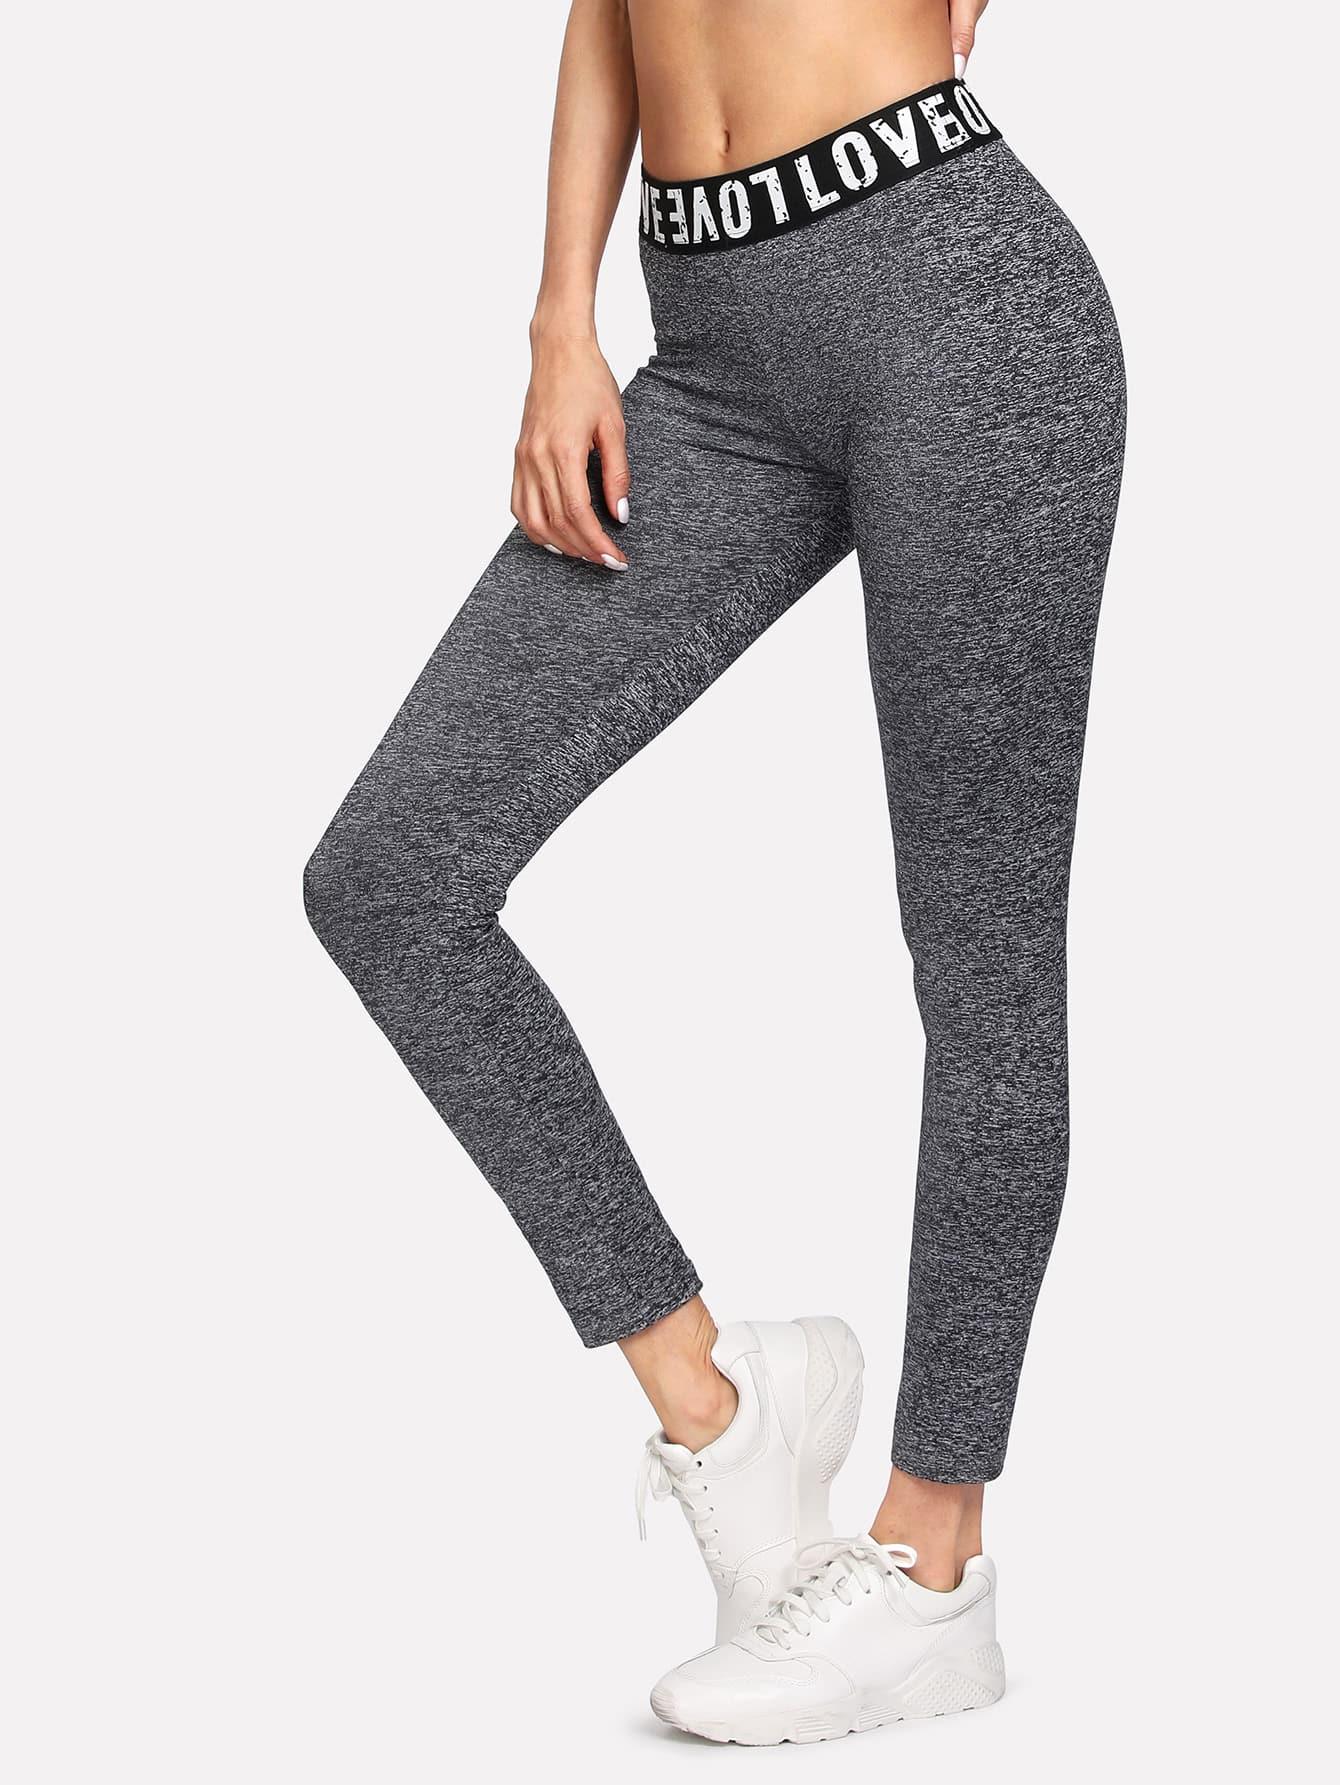 Slogan Print Stretchy Skinny Leggings stretchy printed leggings